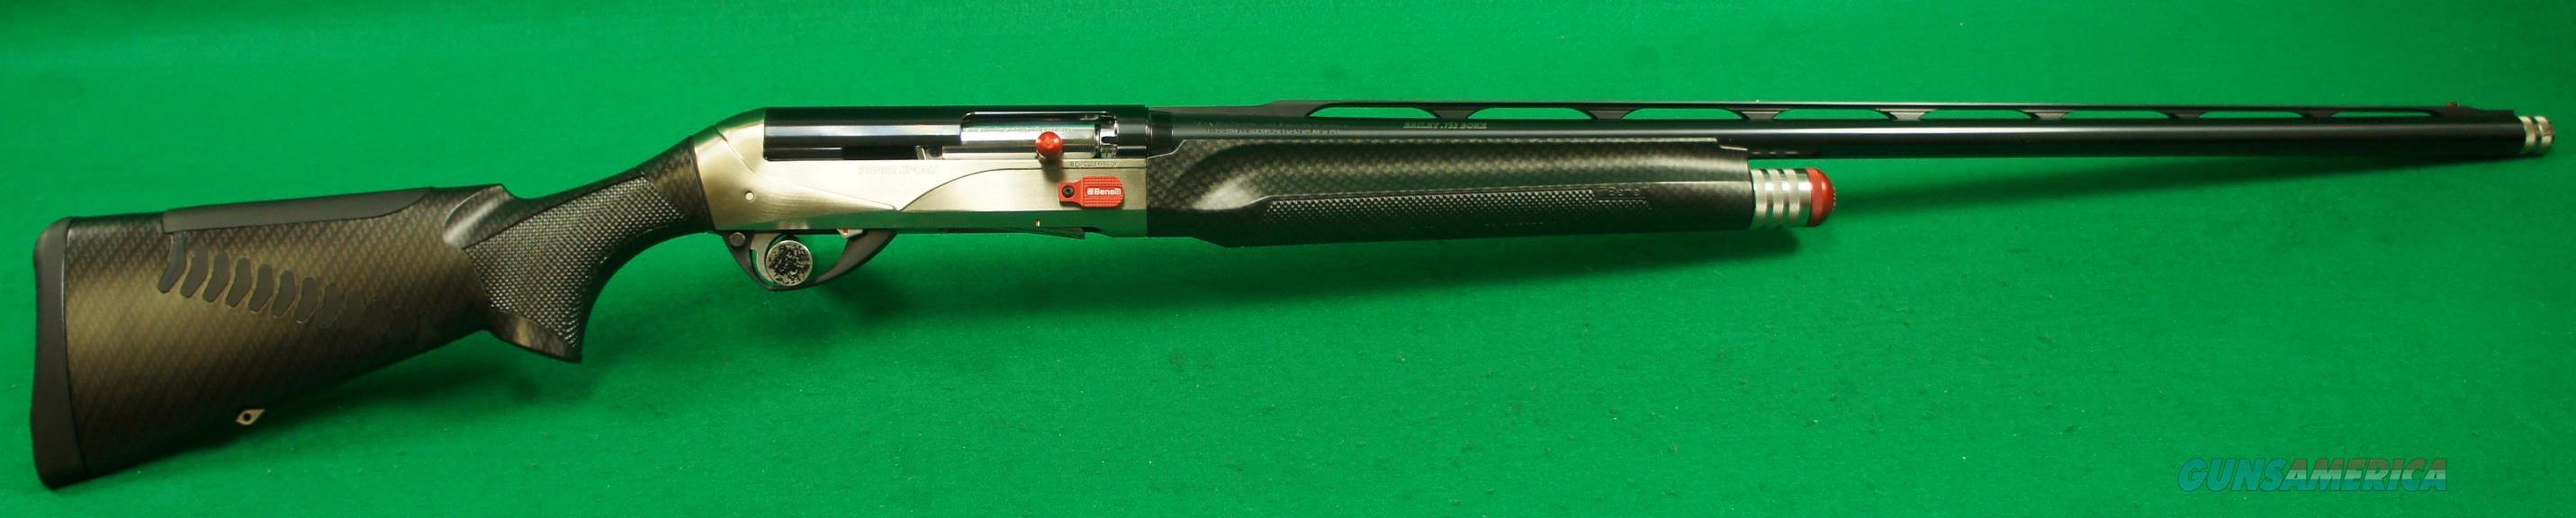 Benelli Performance Supersport 12 Ga 30-3In - 10634  Guns > Shotguns > Benelli Shotguns > Sporting